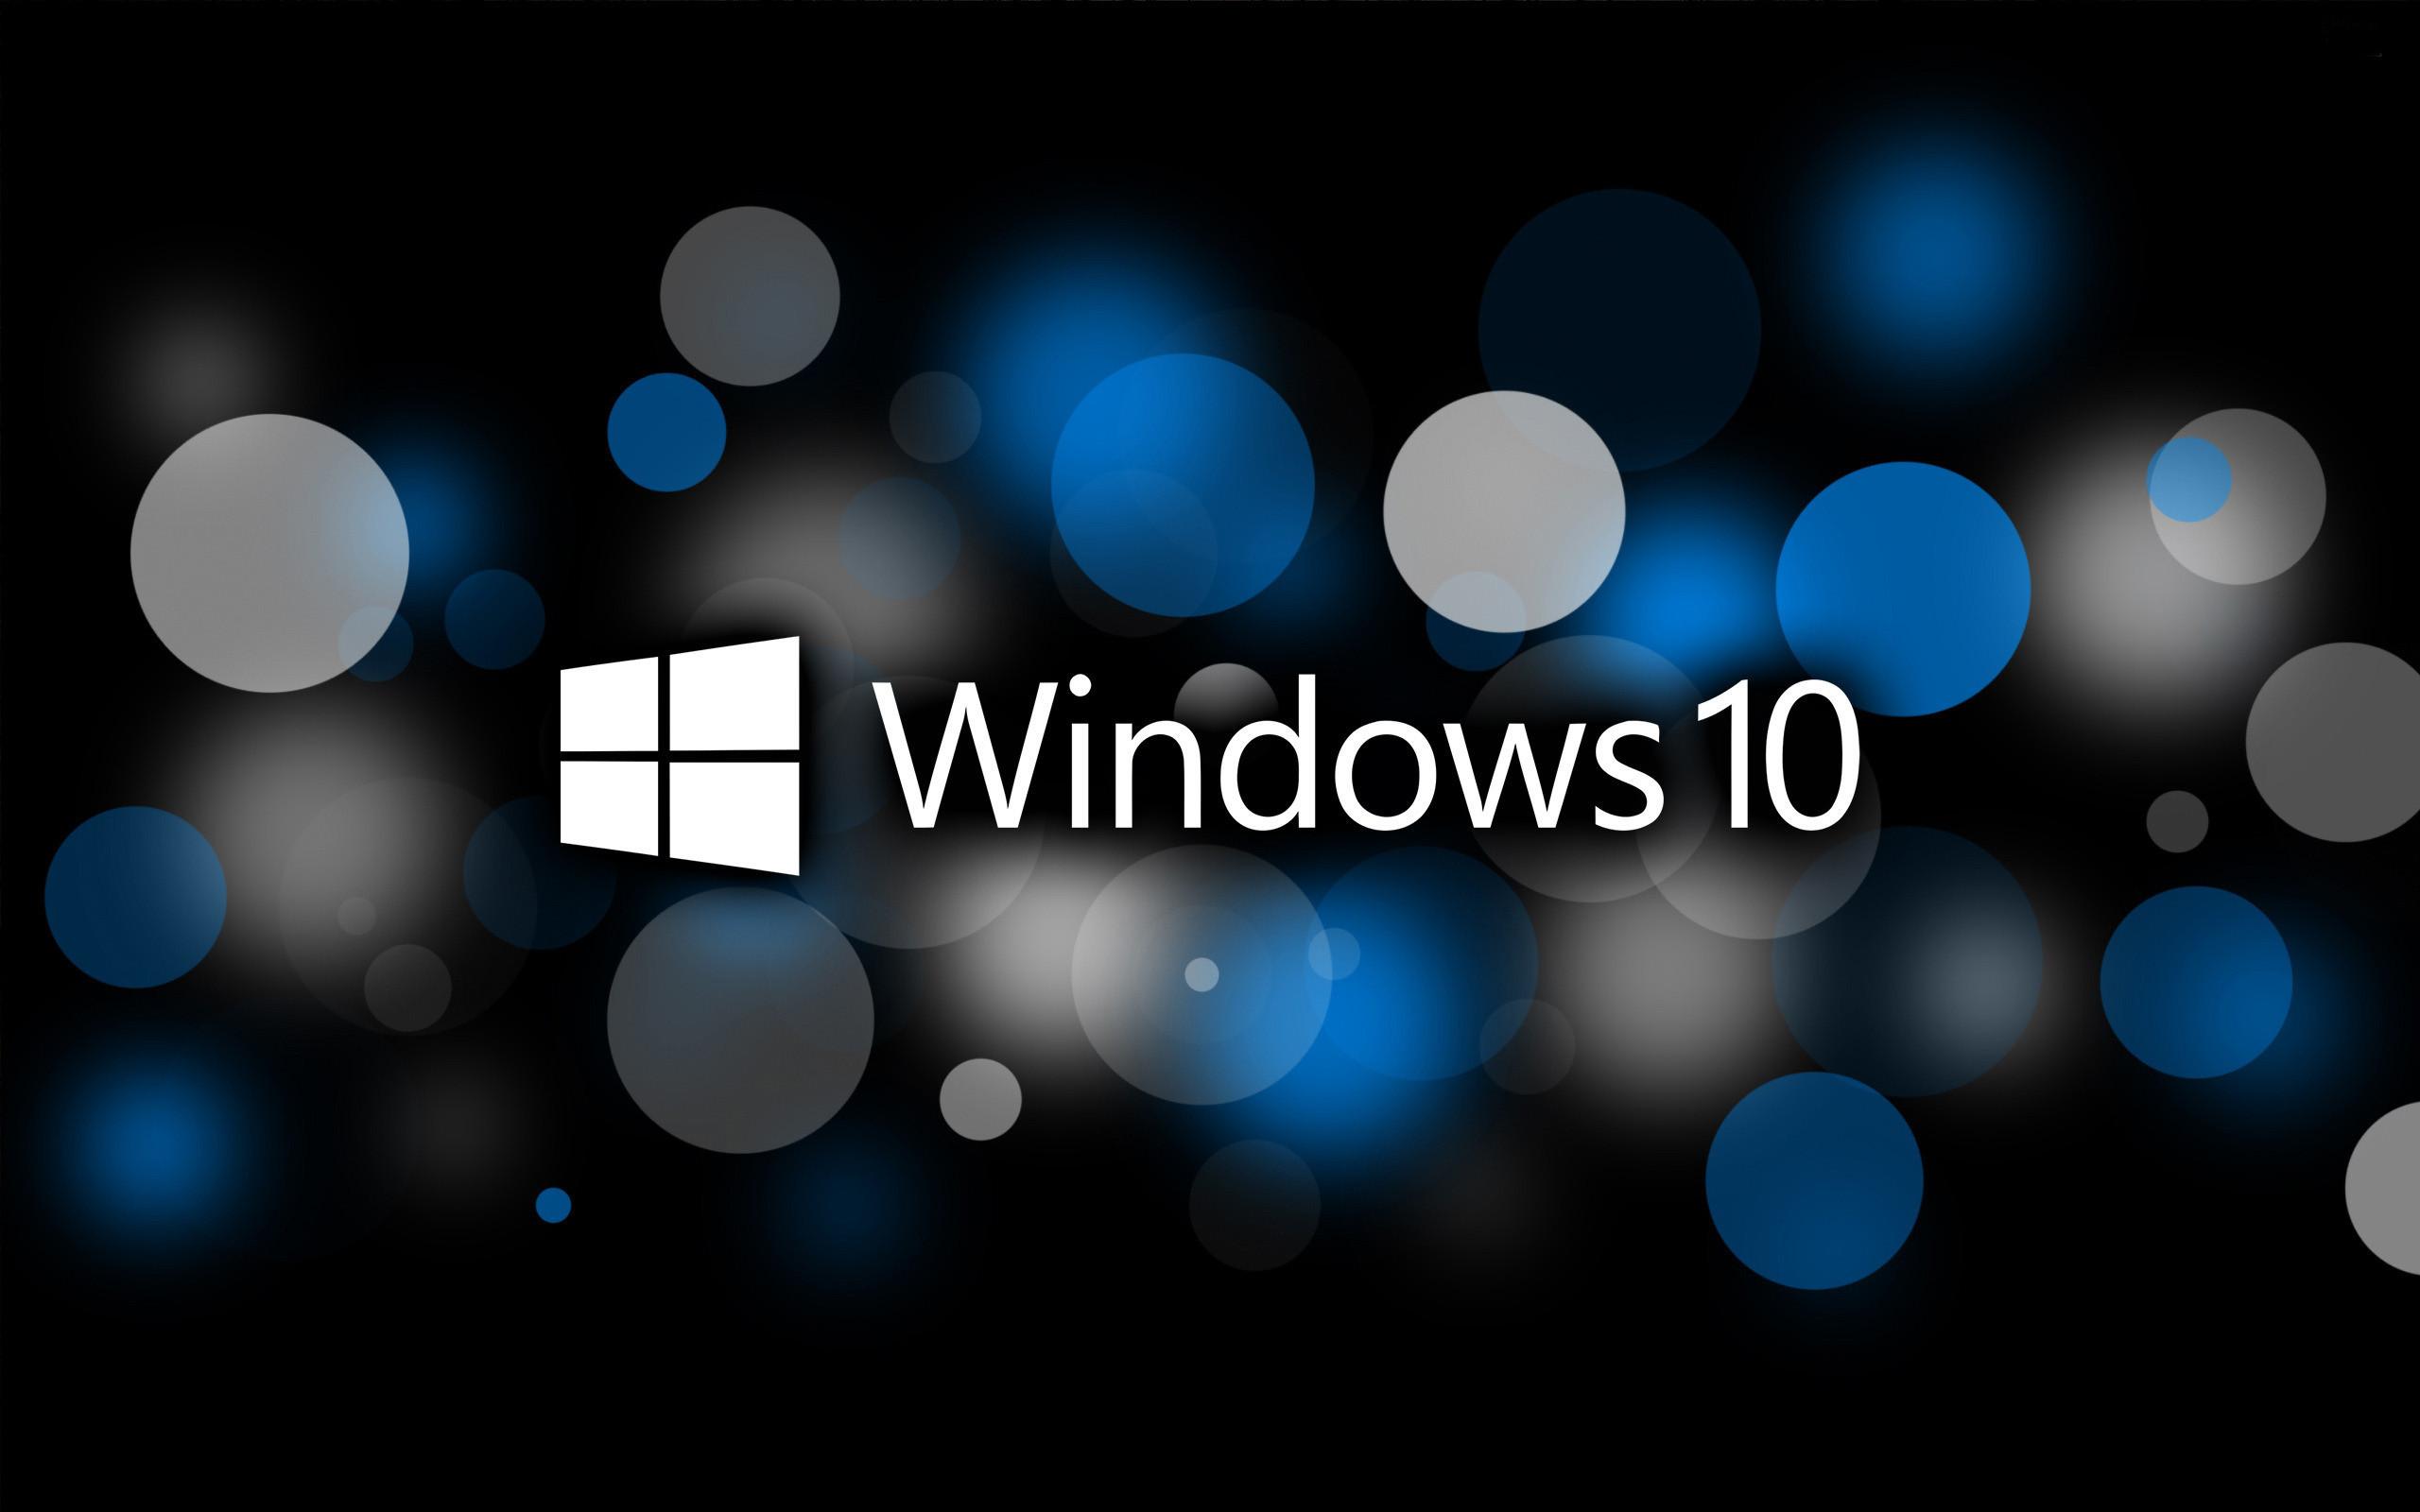 Windows 10 wallpapers hd wallpapersafari – Windows 10 Wallpaper On  Wallpaperget Com